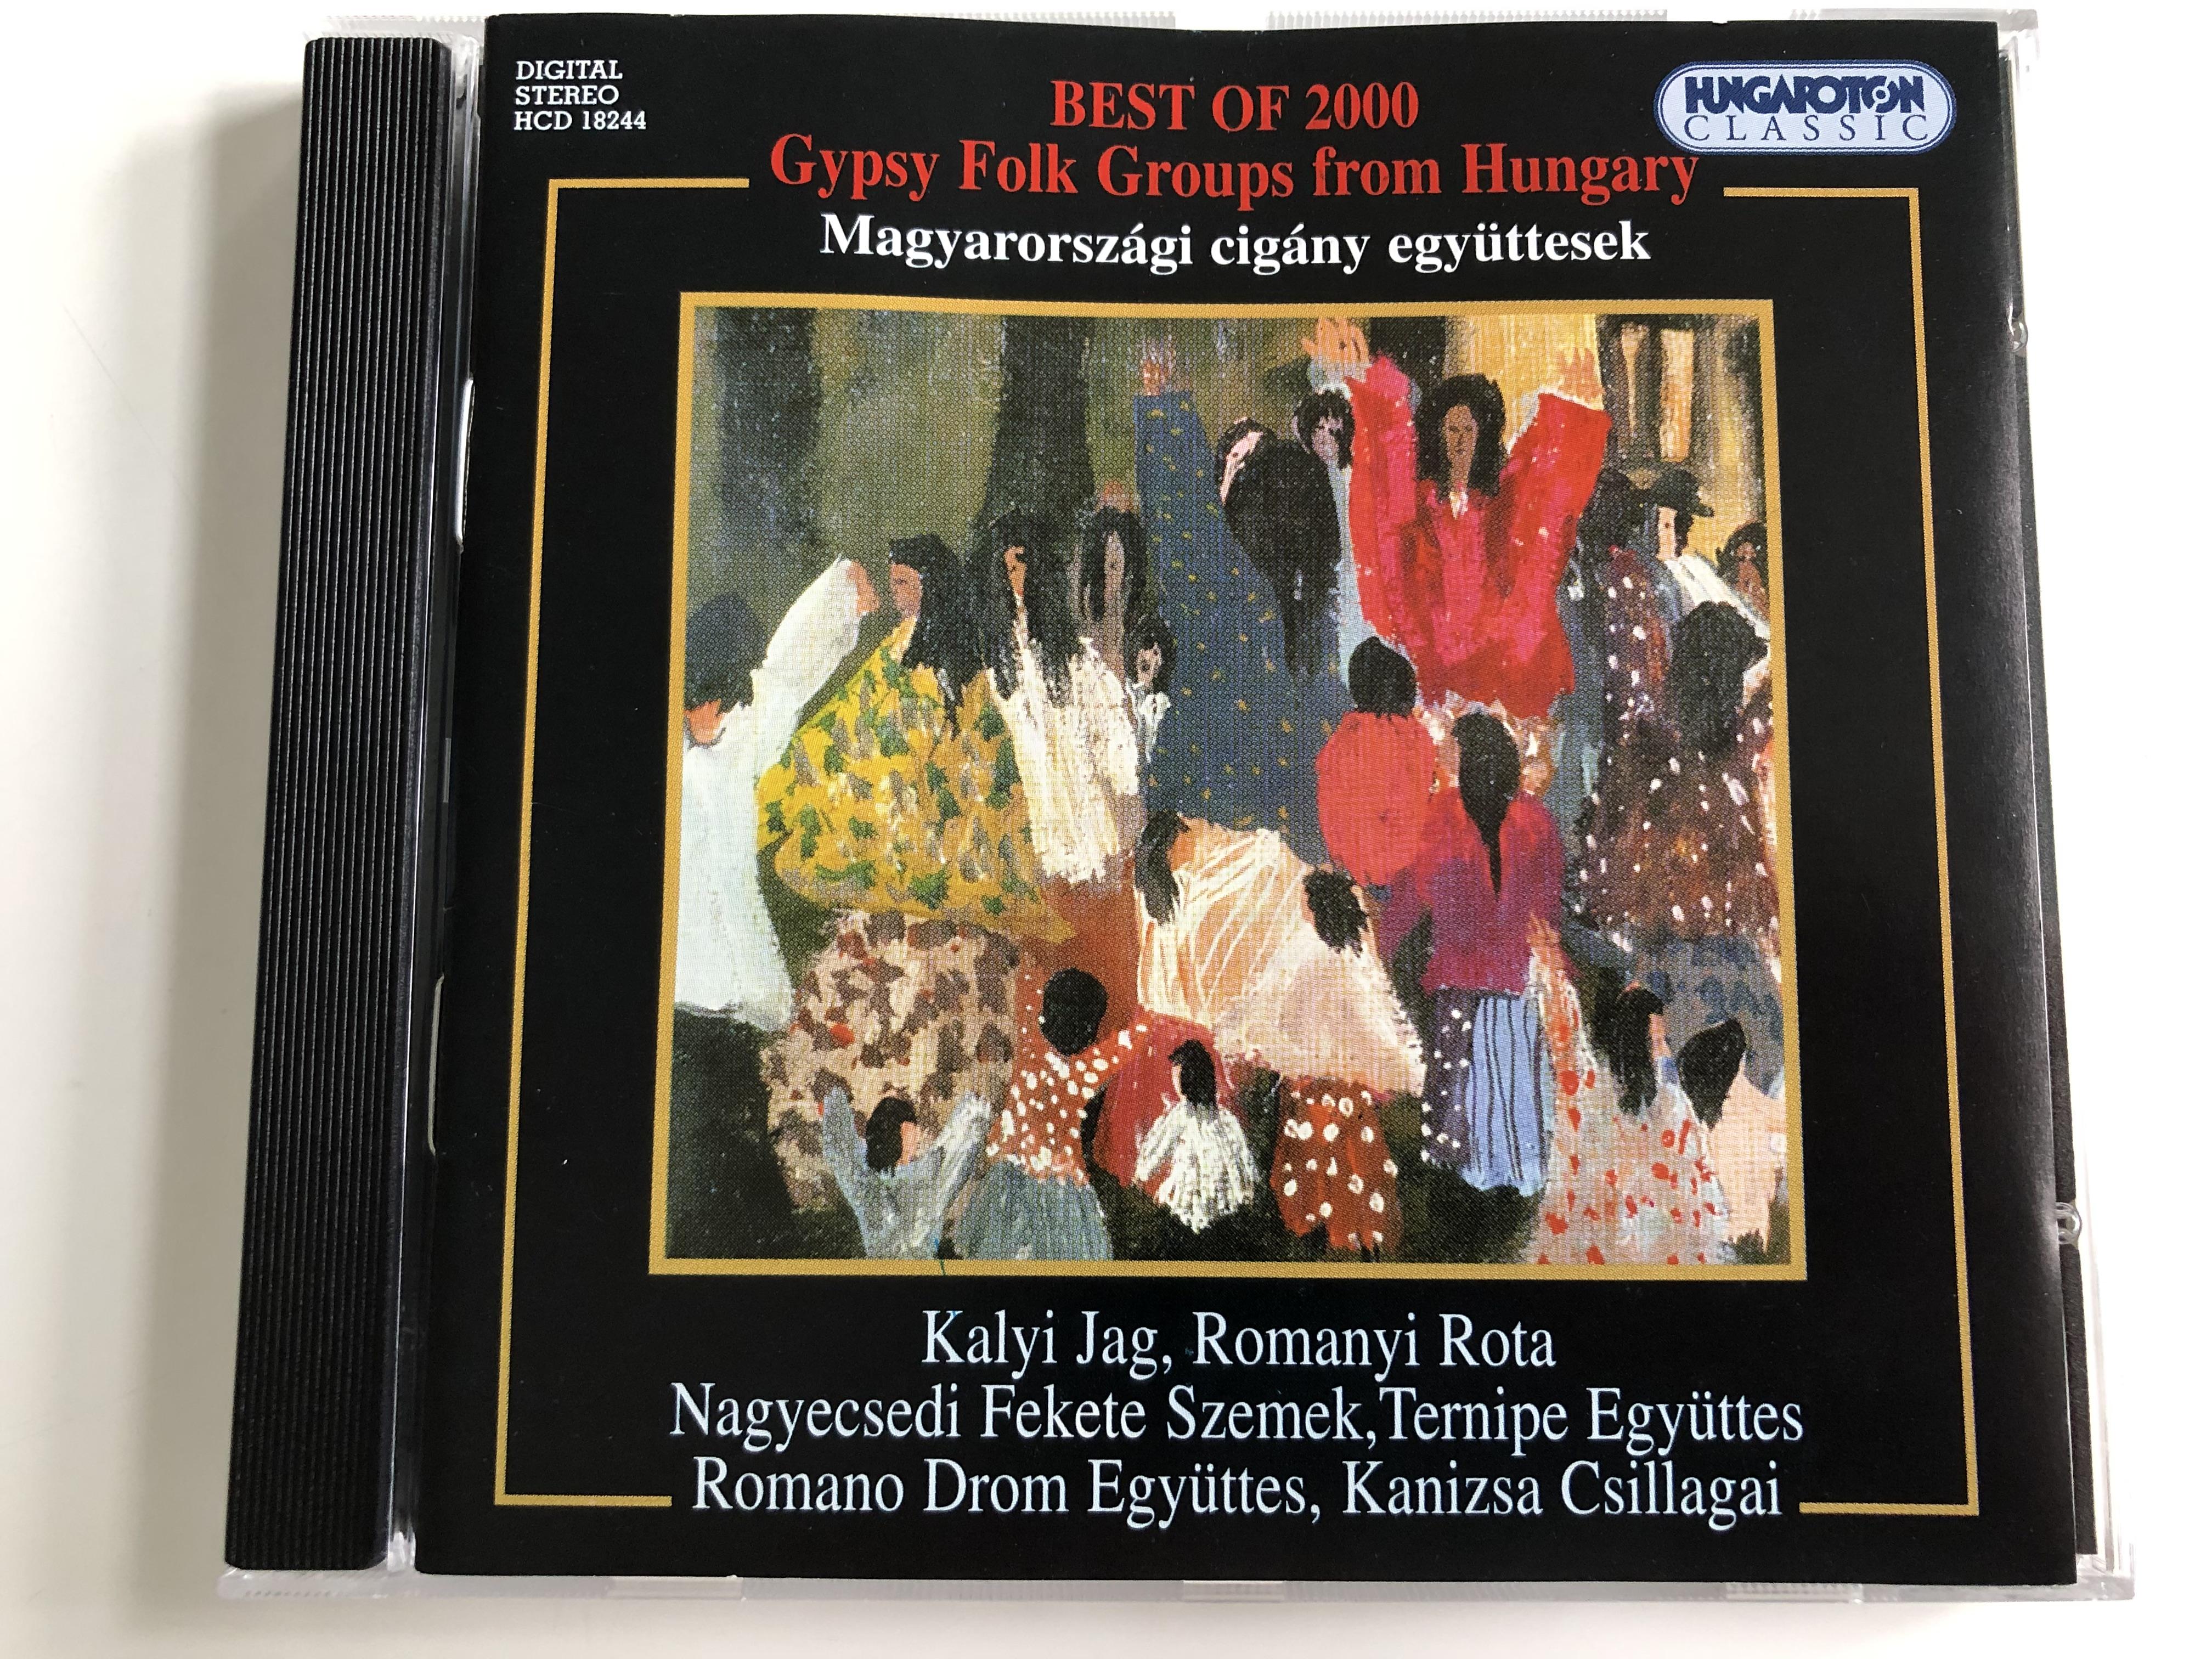 best-of-2000-gypsy-folk-groups-from-hungary-magyarorsz-gi-cig-ny-egy-ttesek-kalyi-jag-romanyi-rota-nagyecsedi-fekete-szemek-ternipe-egyuttes.-romano-drom-egyuttes-kanizsa-csillagai-hunga-1-.jpg